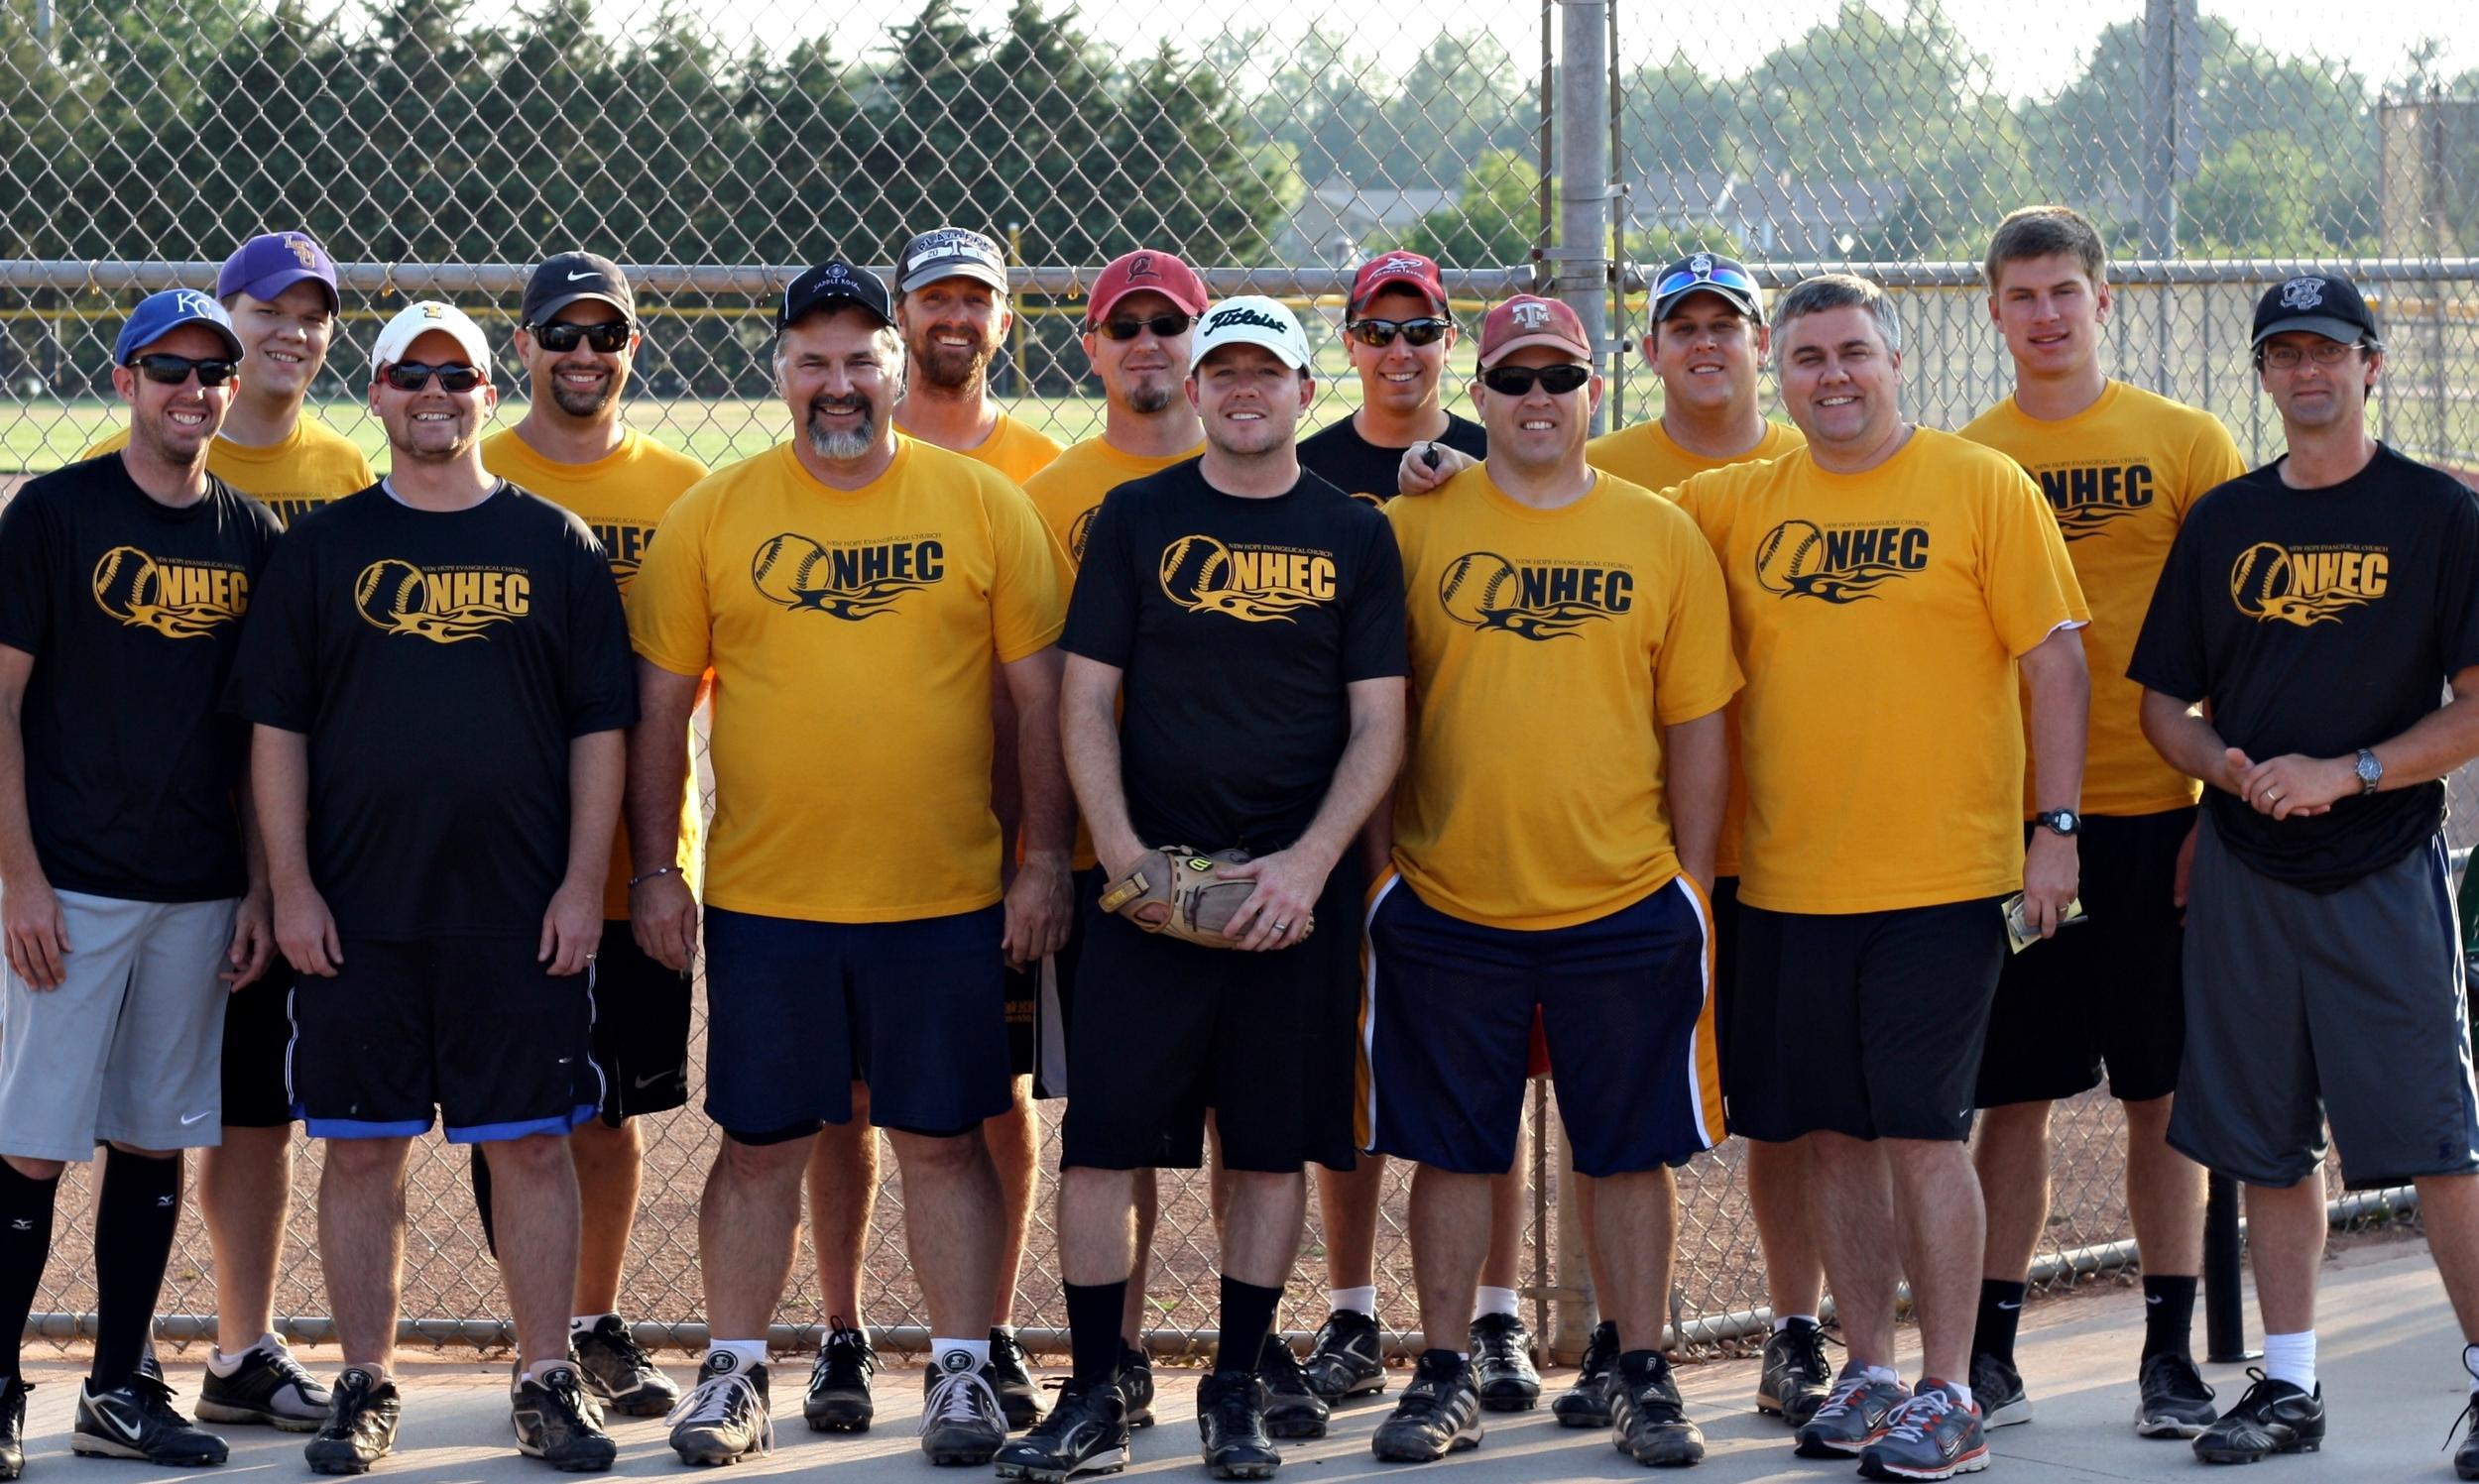 softball team pic crop.jpg